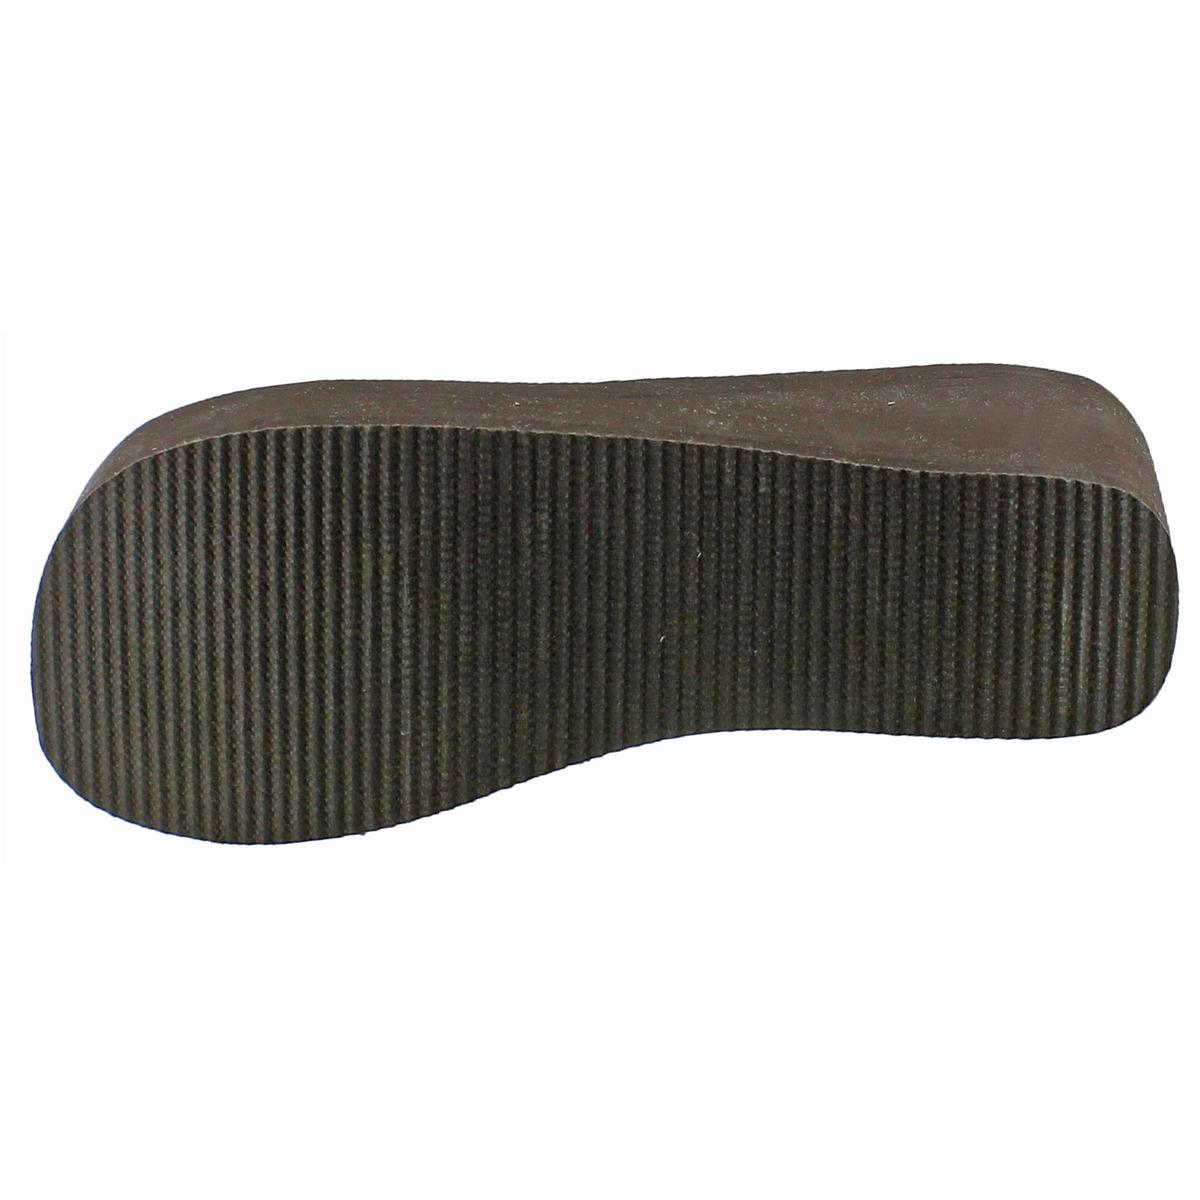 Volatile-Billyray-Women-039-s-Studded-Metallic-Slip-On-Platform-Wedge-Sandals-Shoes thumbnail 5